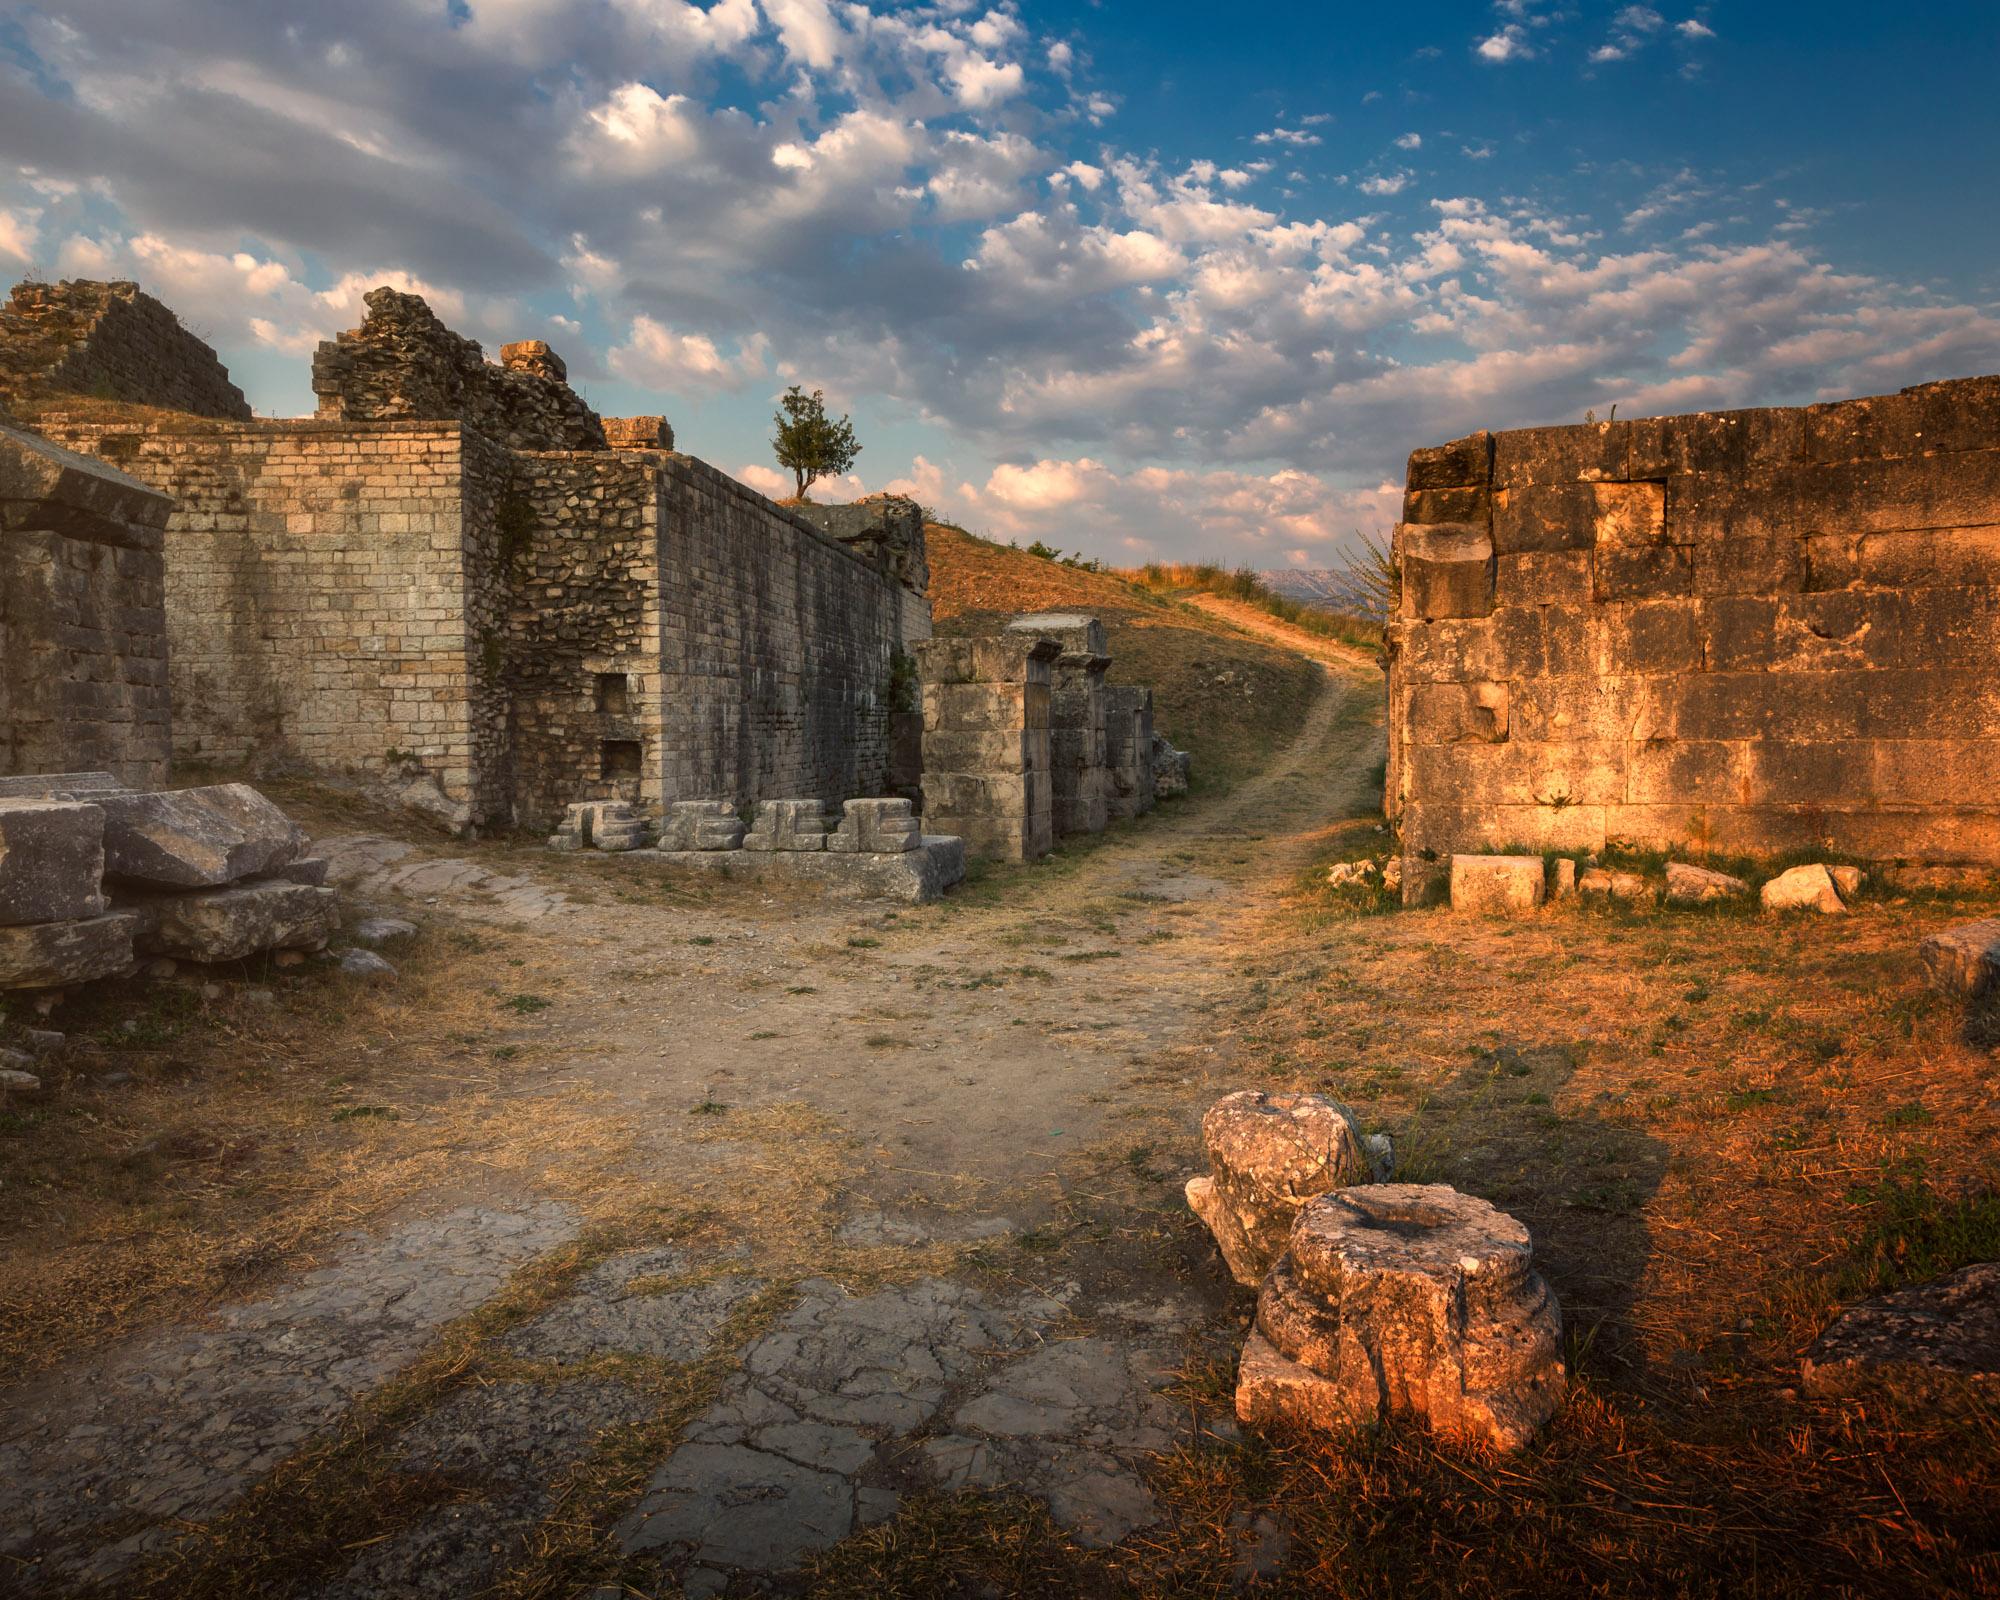 Ruins of Ancient Roman City of Salona, Split, Croatia